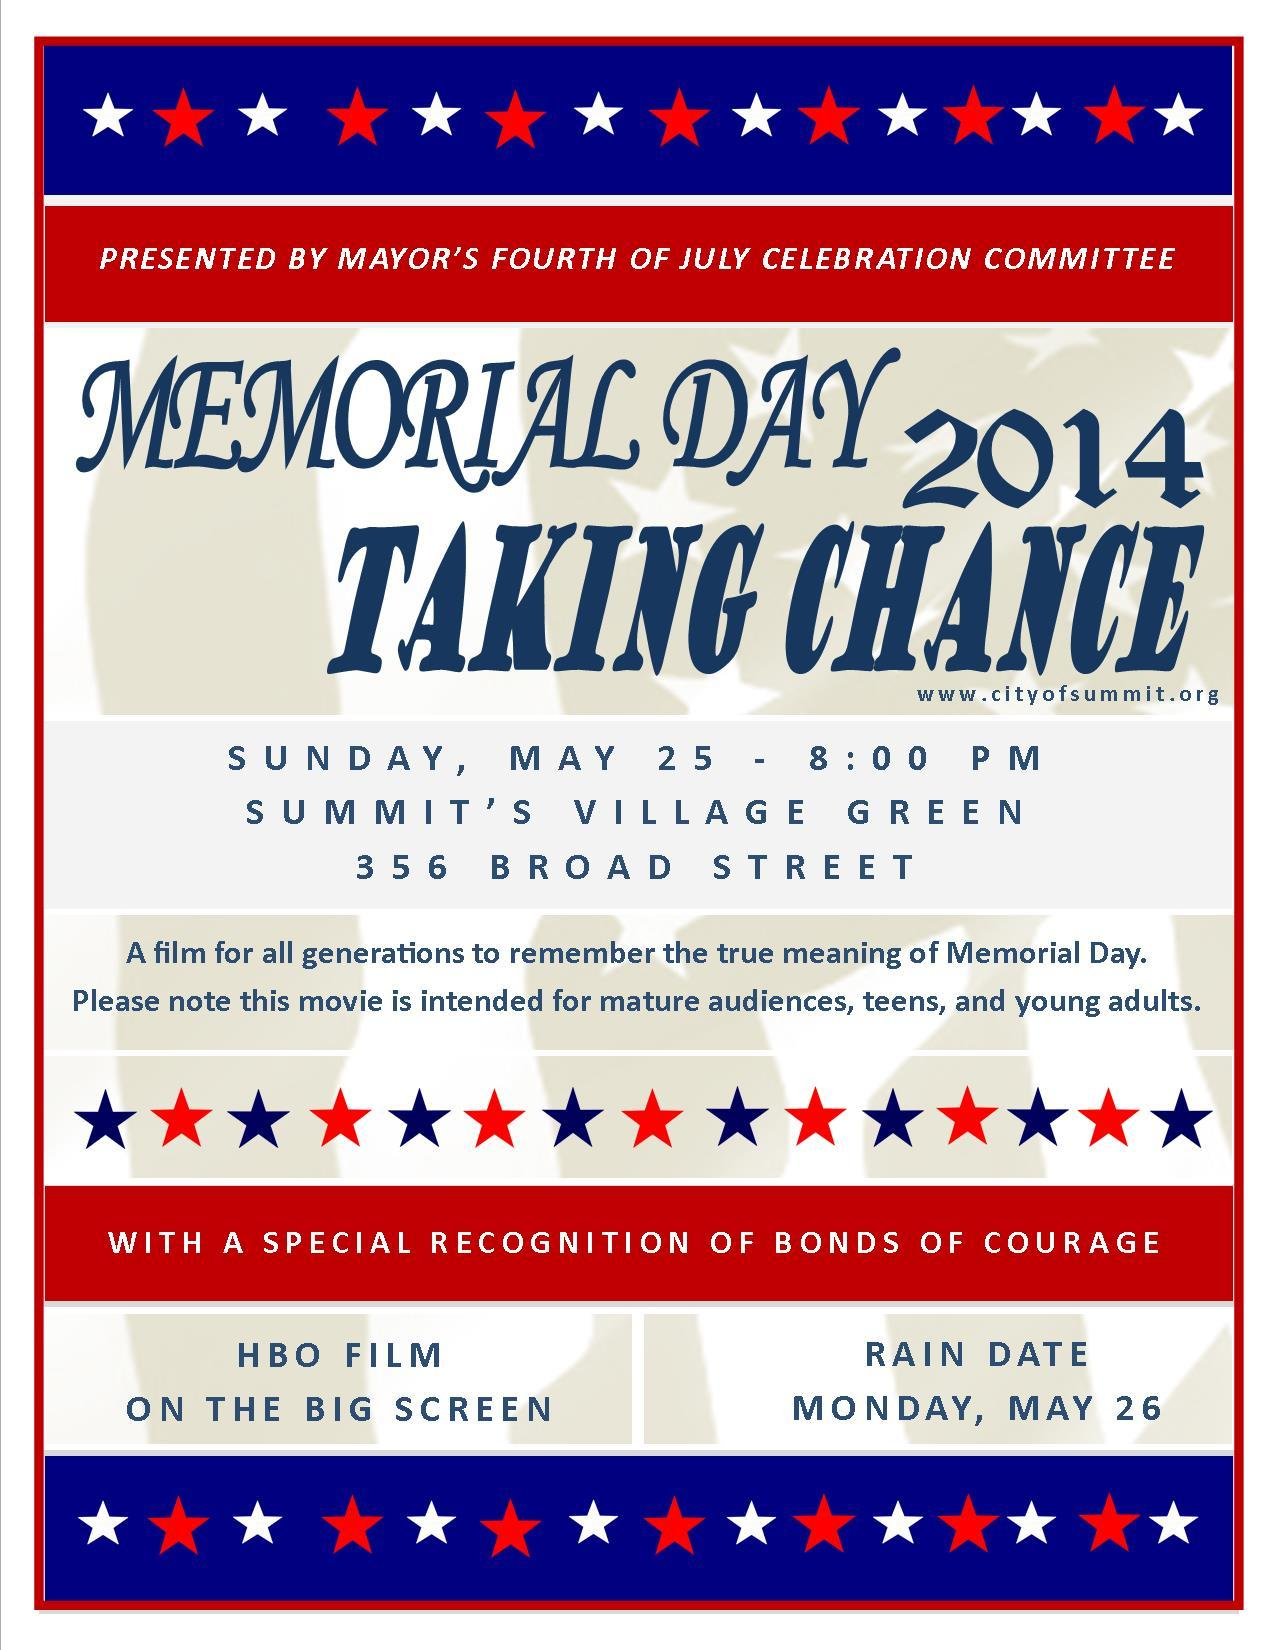 5a8d1f4e86b83ee46eaa_Taking_Chance_Memorial_Day.jpg